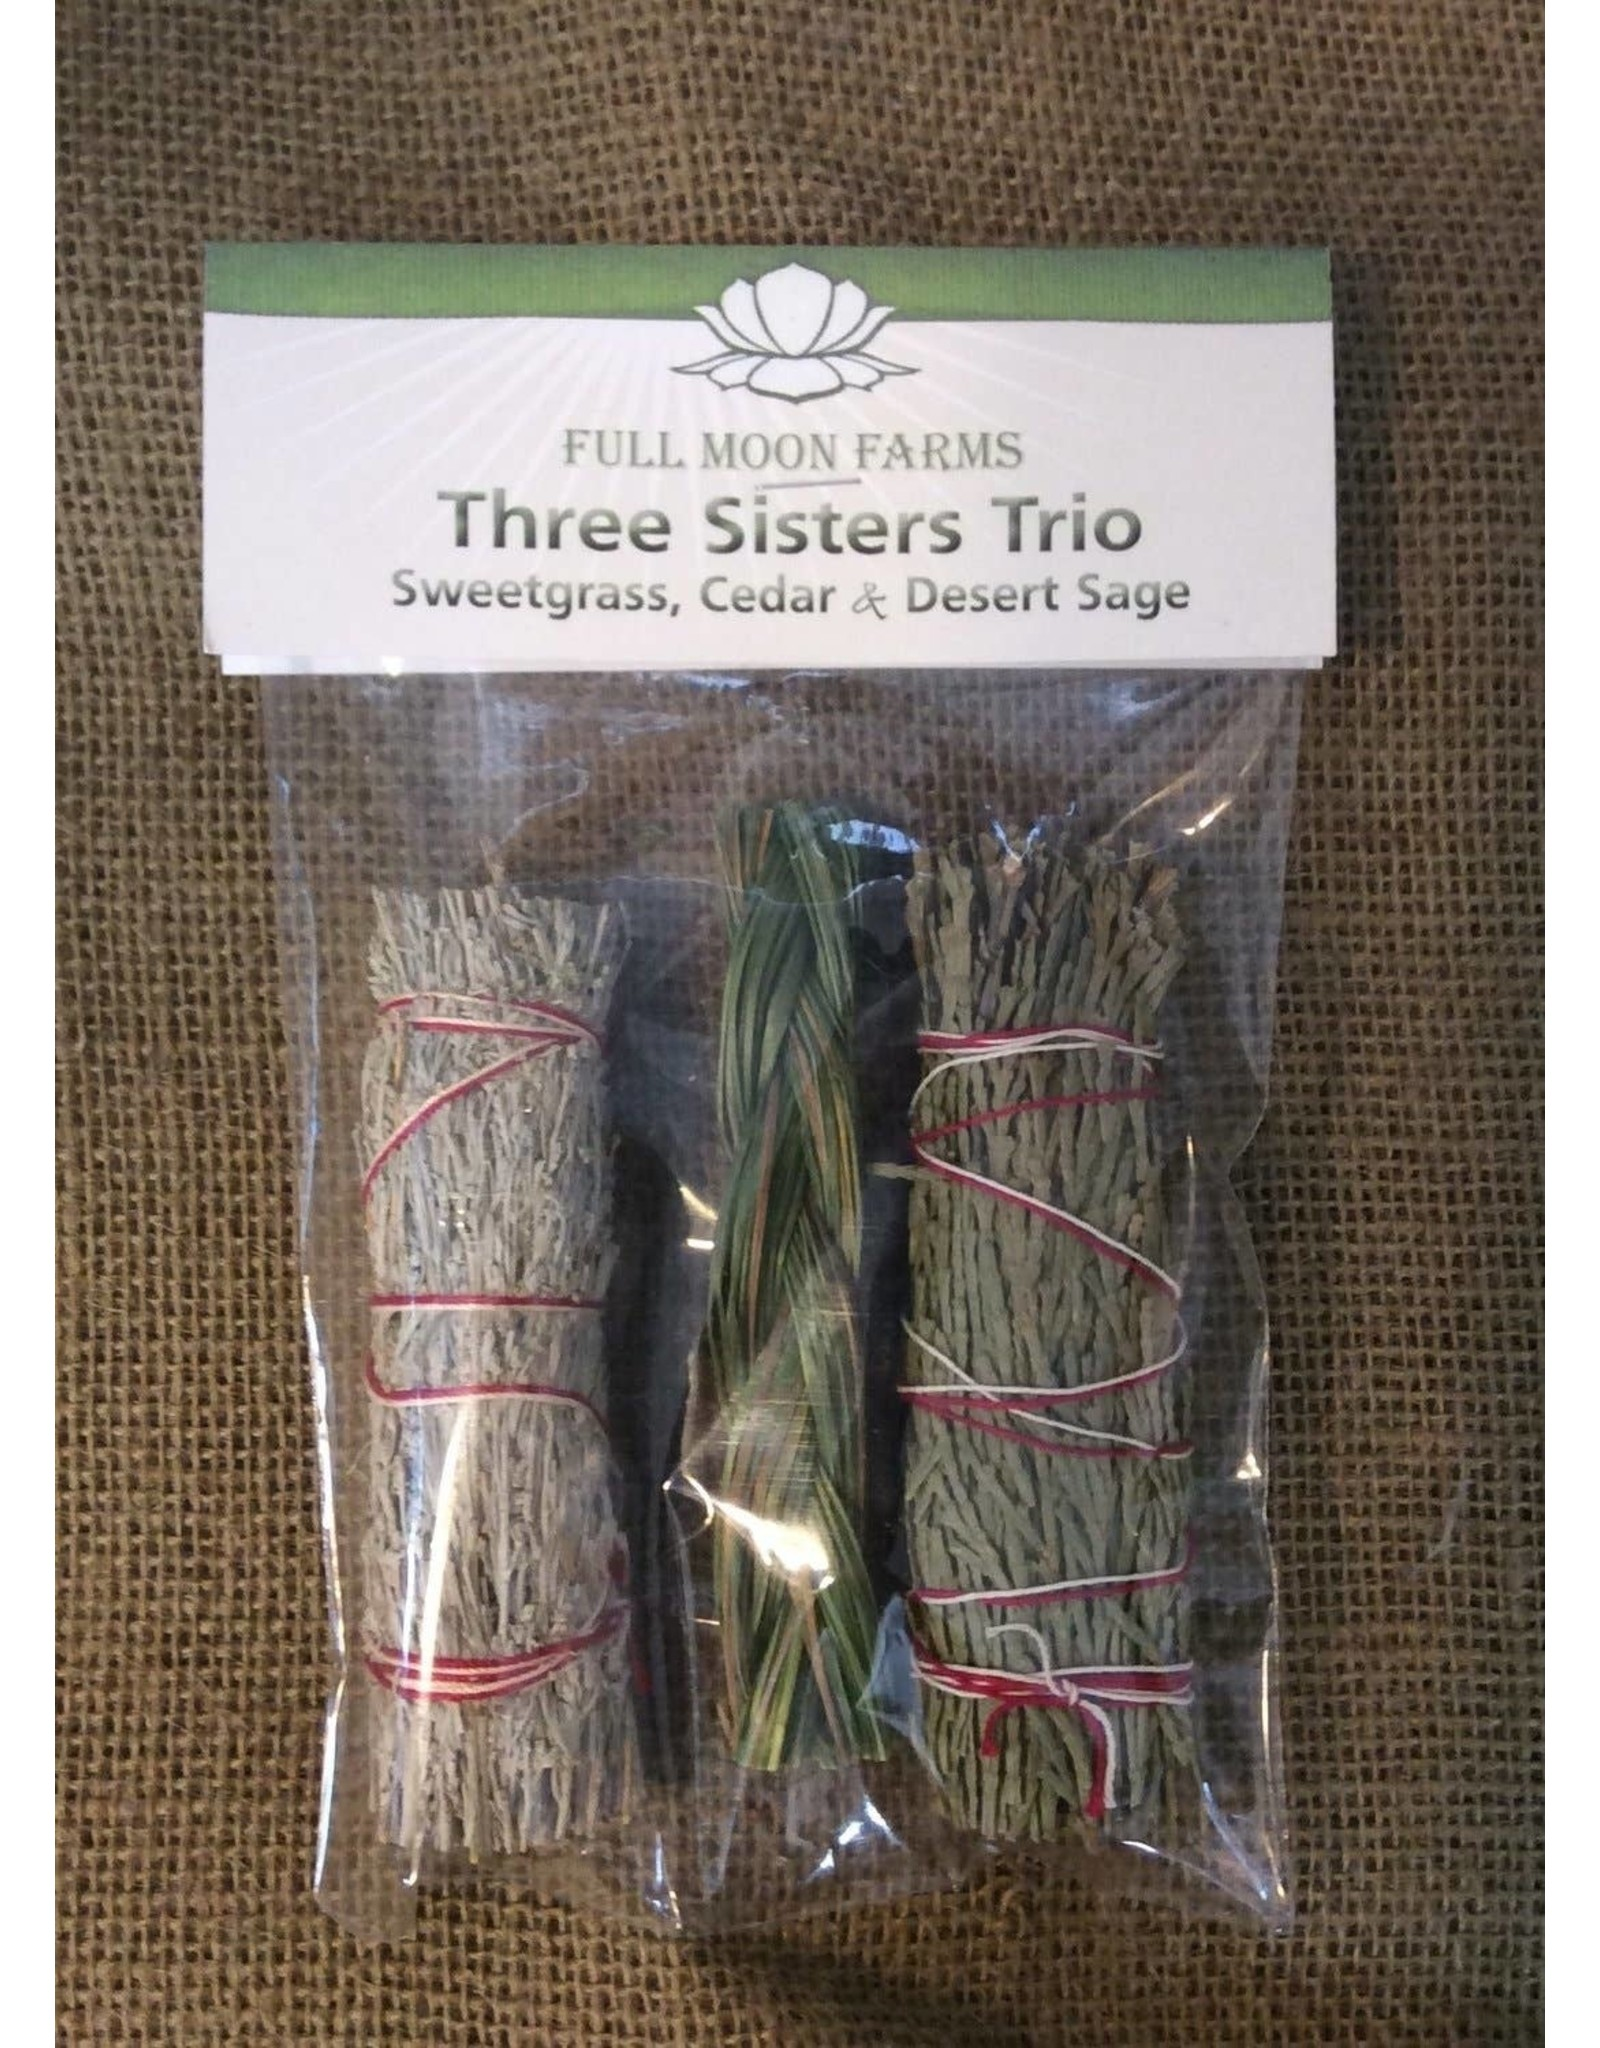 Full Moons Farms Three Sisters Trio   Sweetgrass, Cedar & Desert Sage